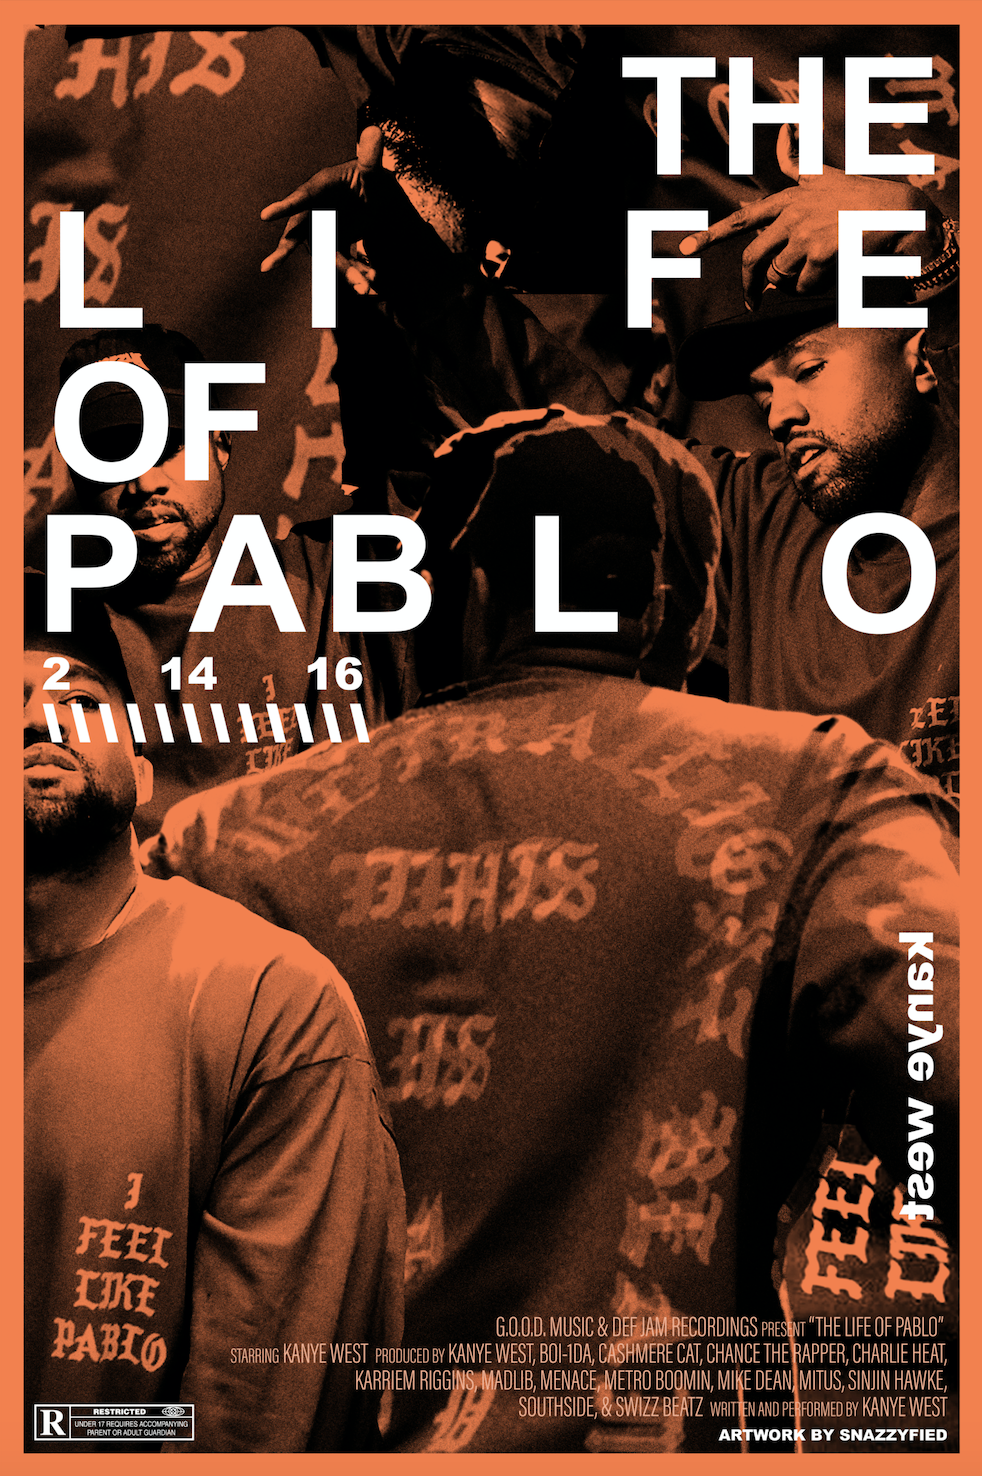 Kanye West 'TLOP' Poster - 12x18